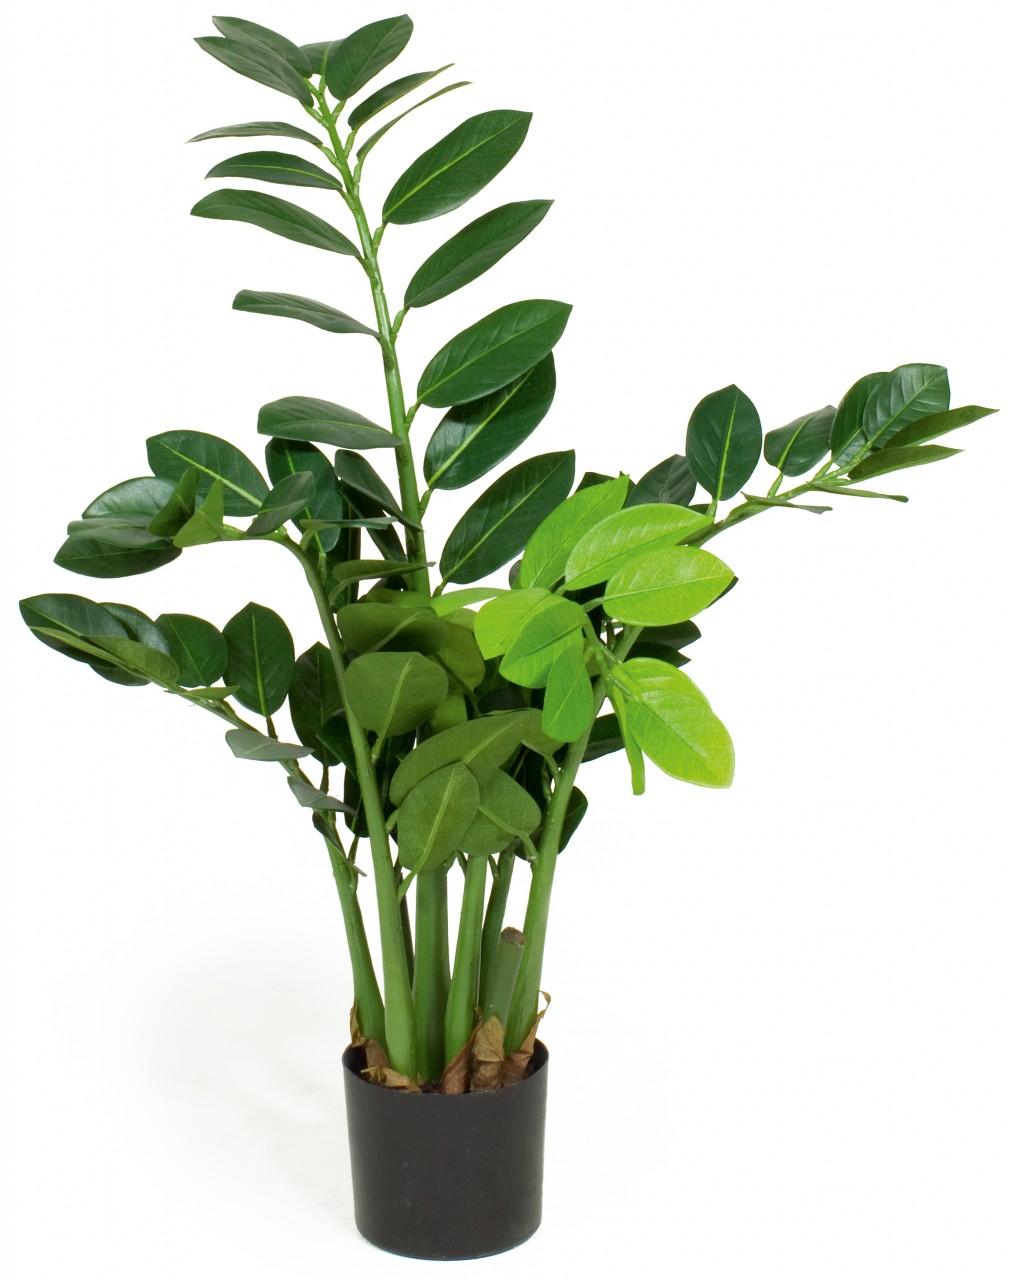 ZAMIOCULCAS Kunstpflanze, 65 cm